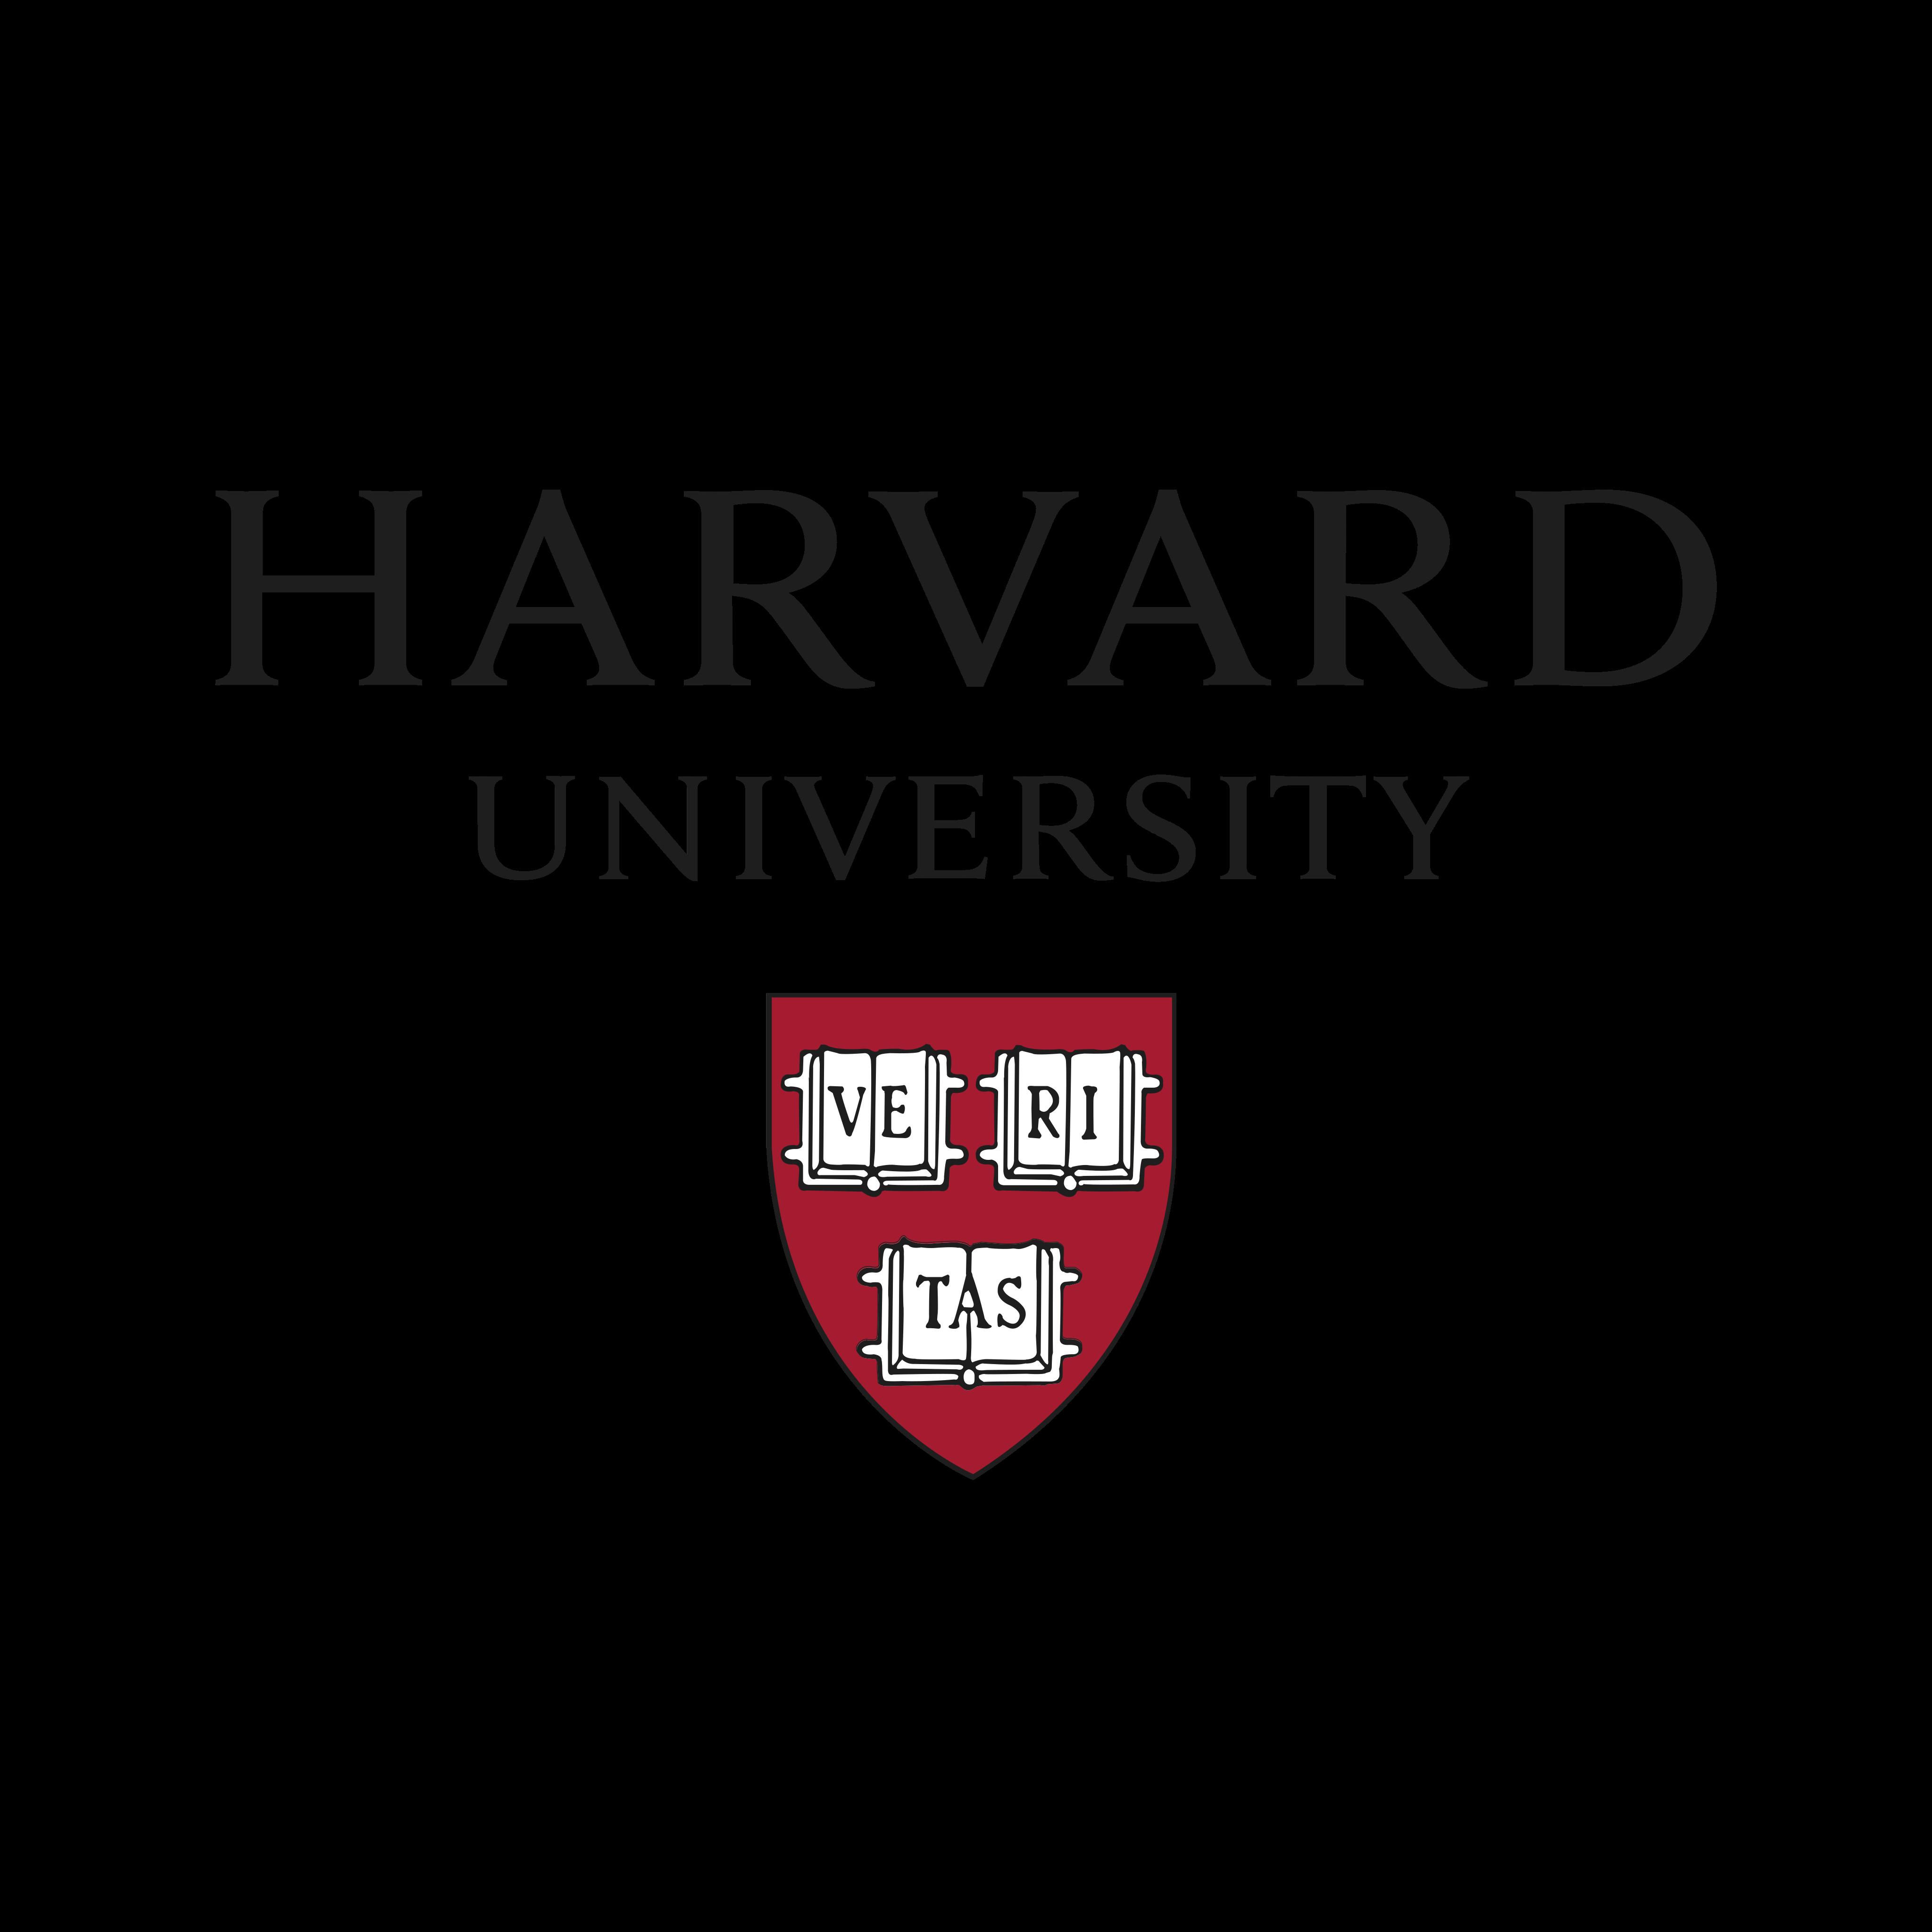 harvard university logo 0 - Universidad Harvard Logo